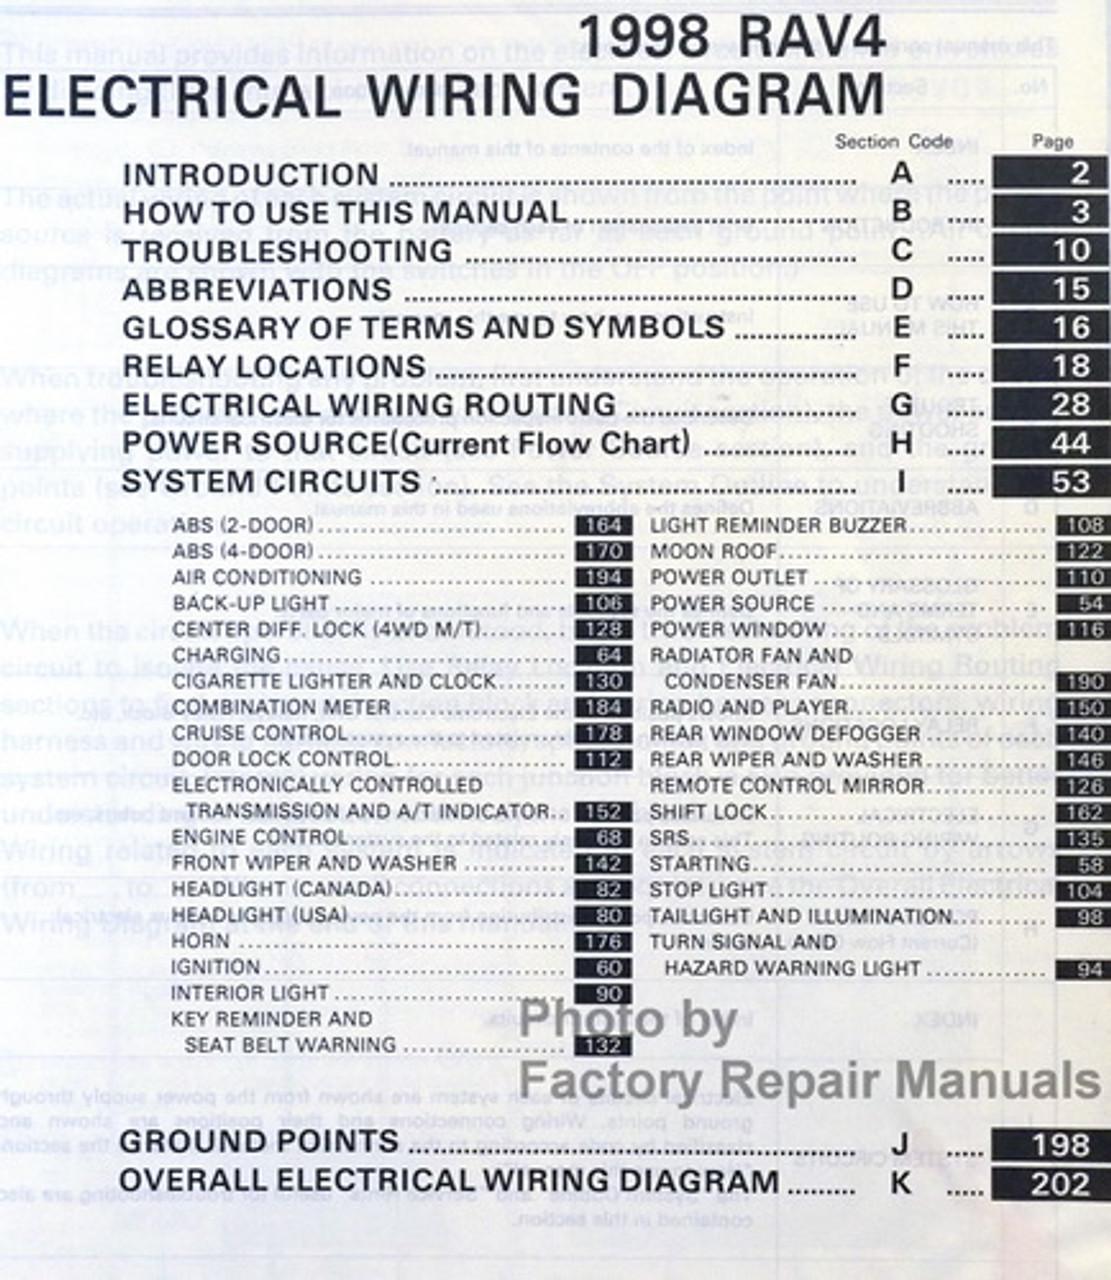 1998 Toyota RAV4 Electrical Wiring Diagrams Original Manual - Factory Repair  Manuals | Wiring Schematics For 1998 Toyota Rav4 |  | Factory Repair Manuals